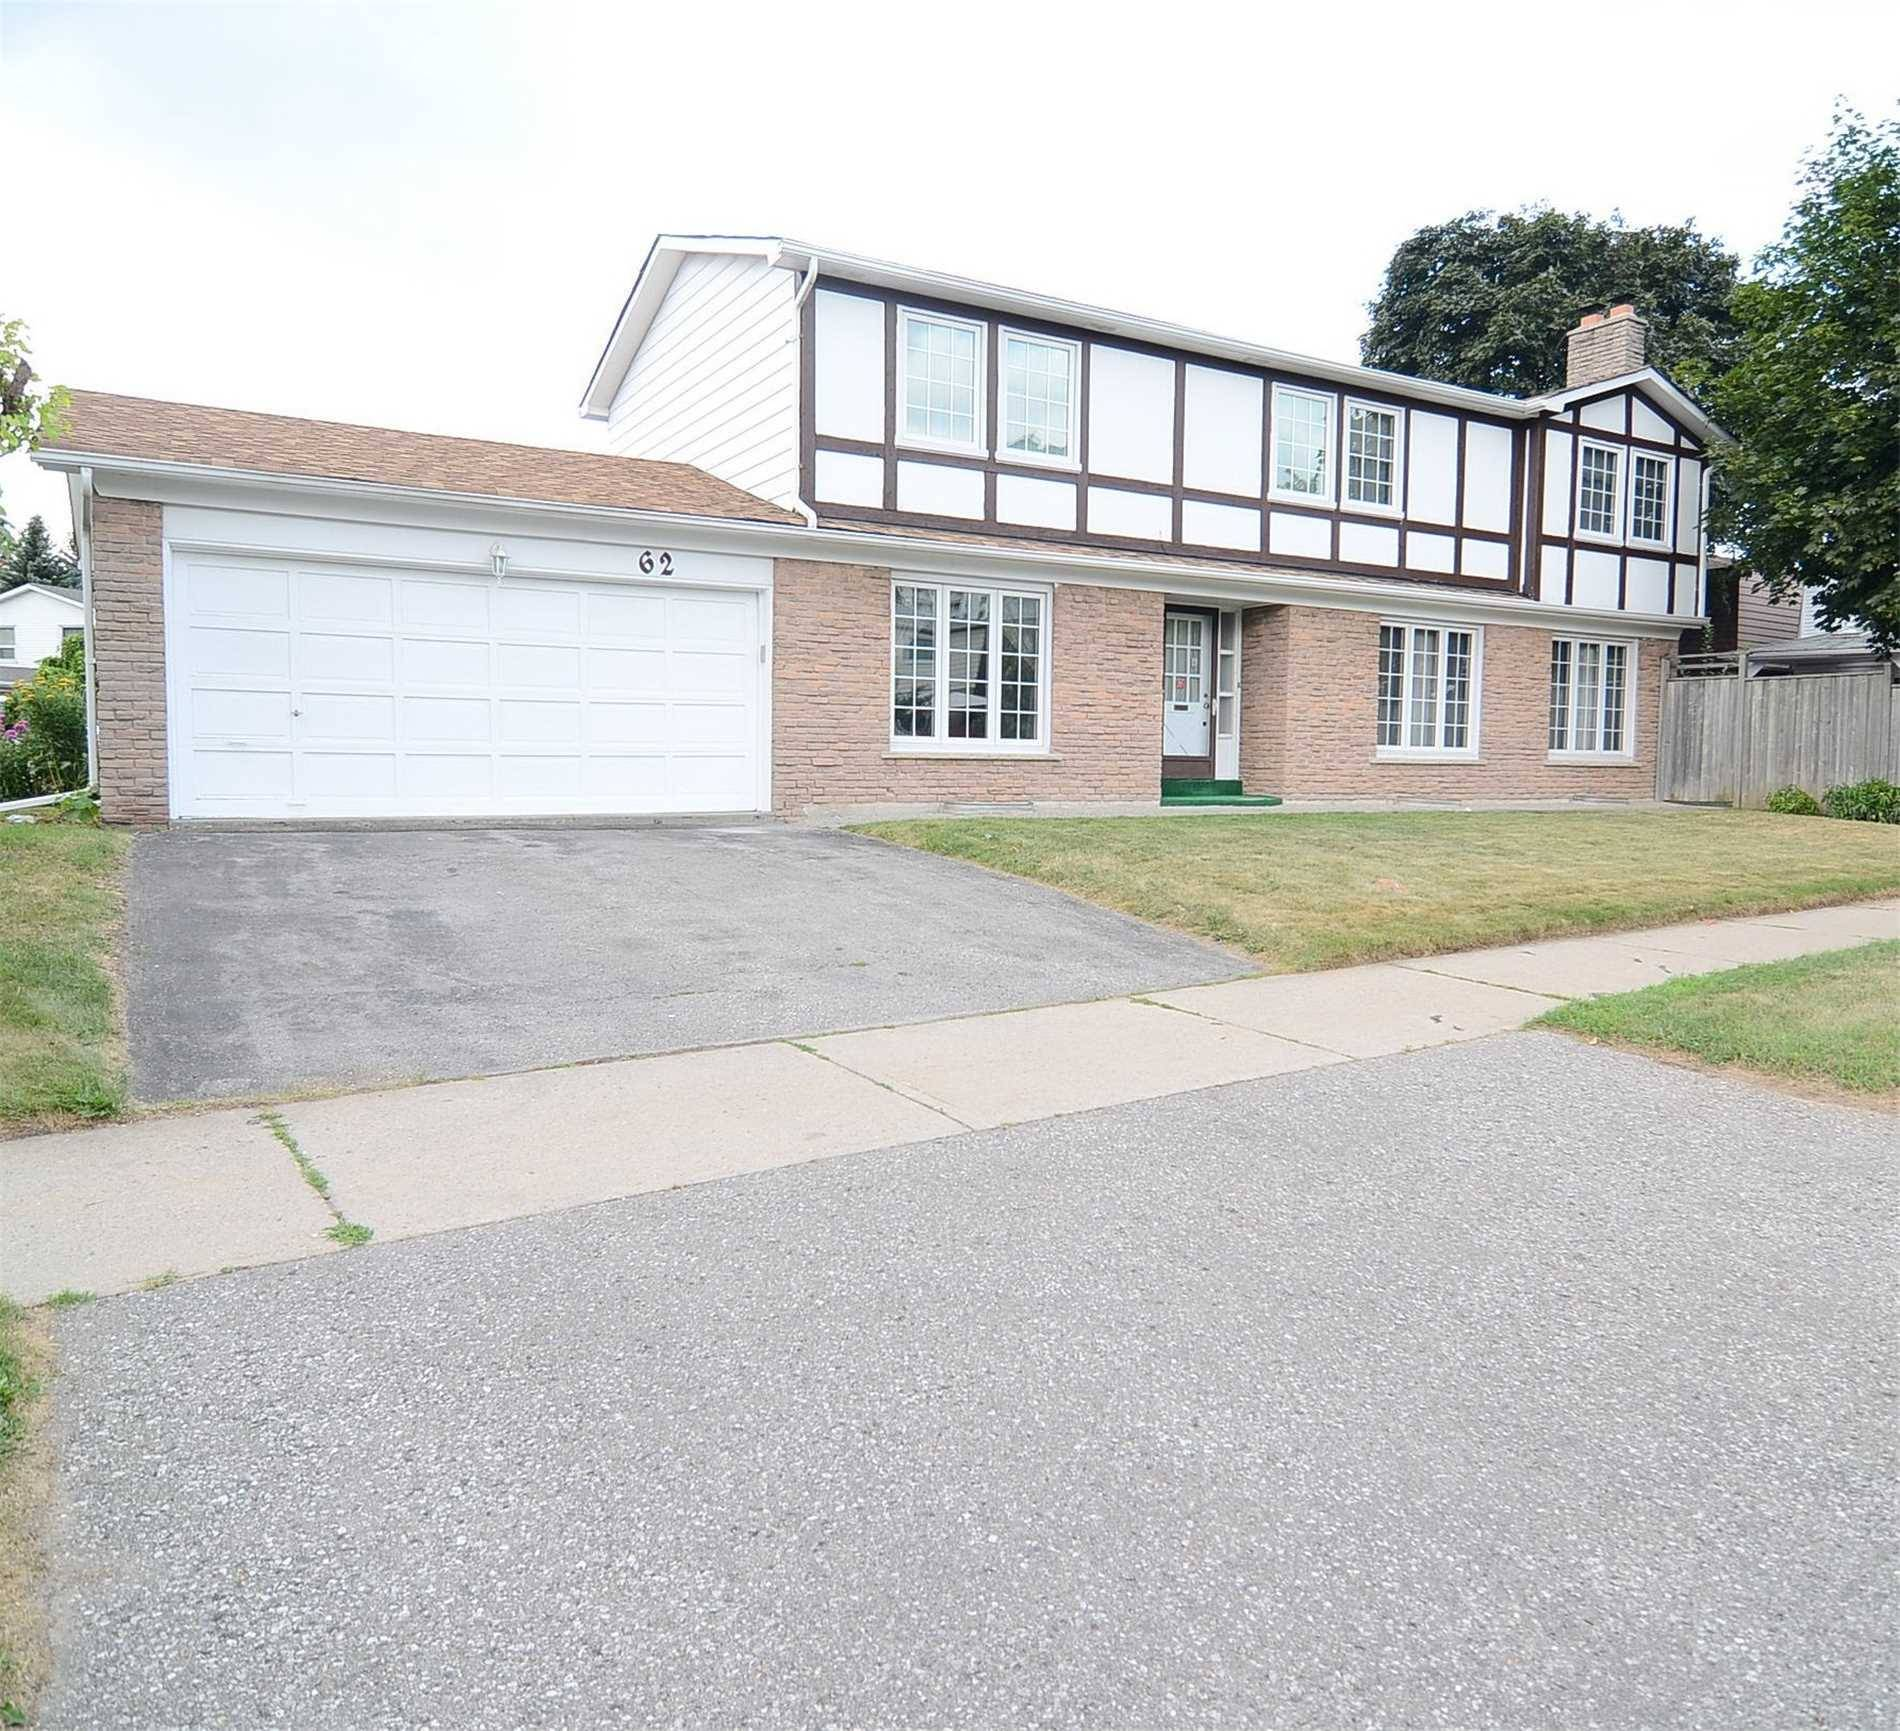 Sandhurst Apartments: 62 Sandhurst Circle, Toronto — For Sale @ $799,900